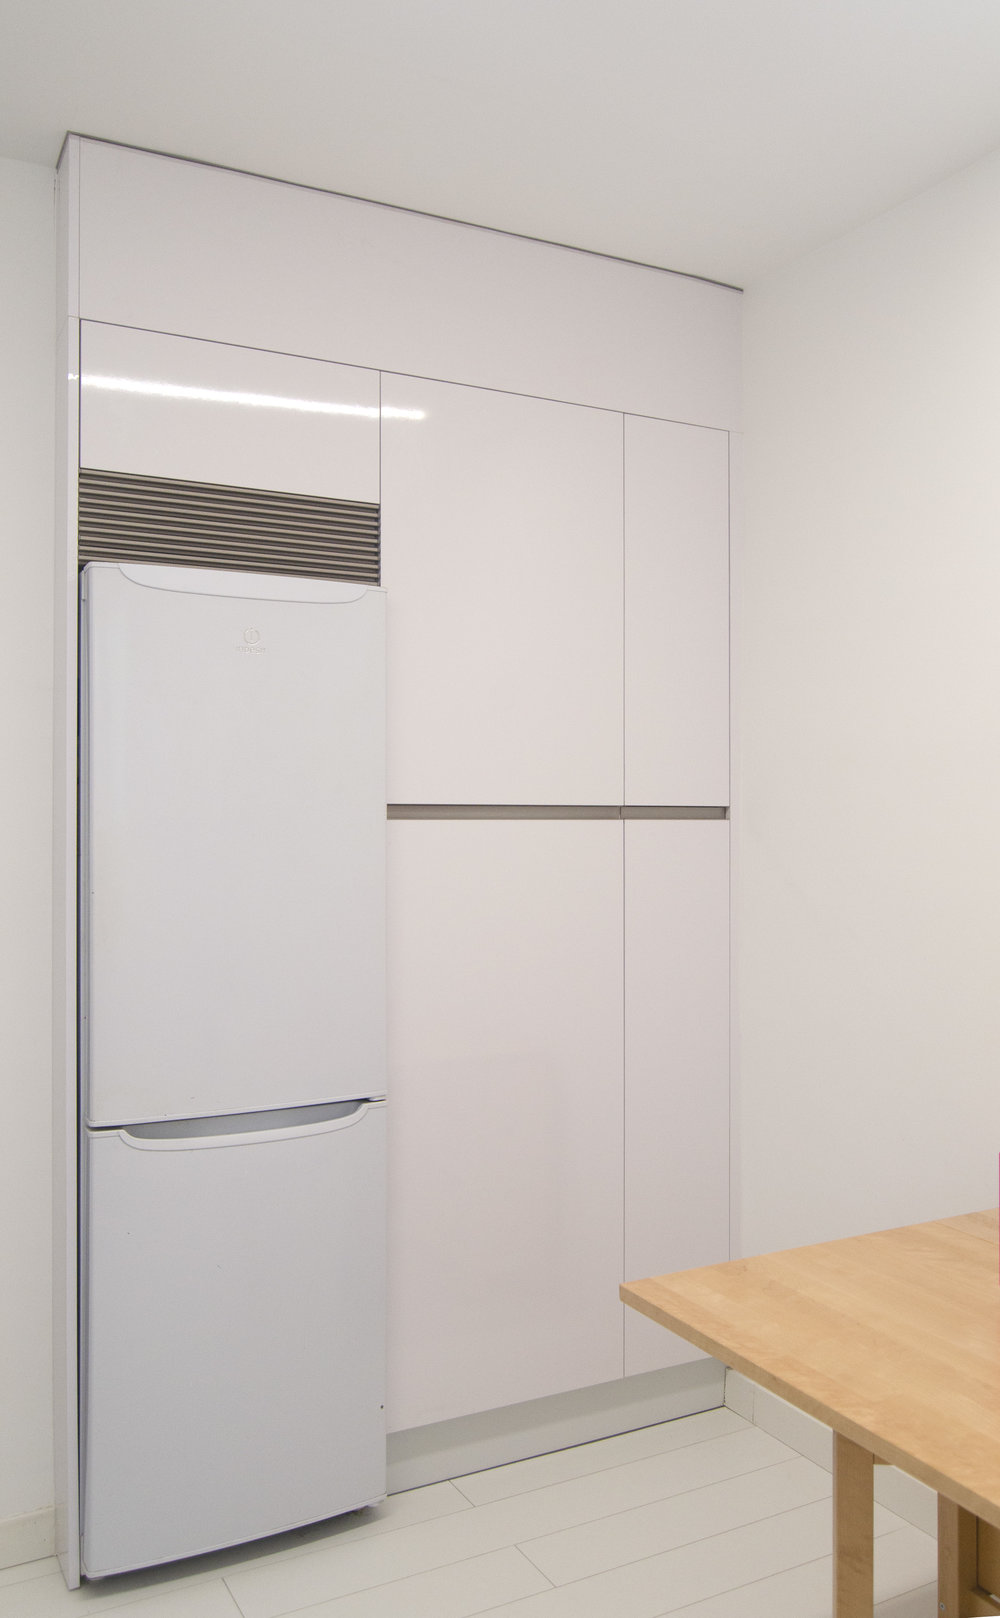 Reforma slow emmme studio cocina almacenaje Alicia - 06 - SM.jpg